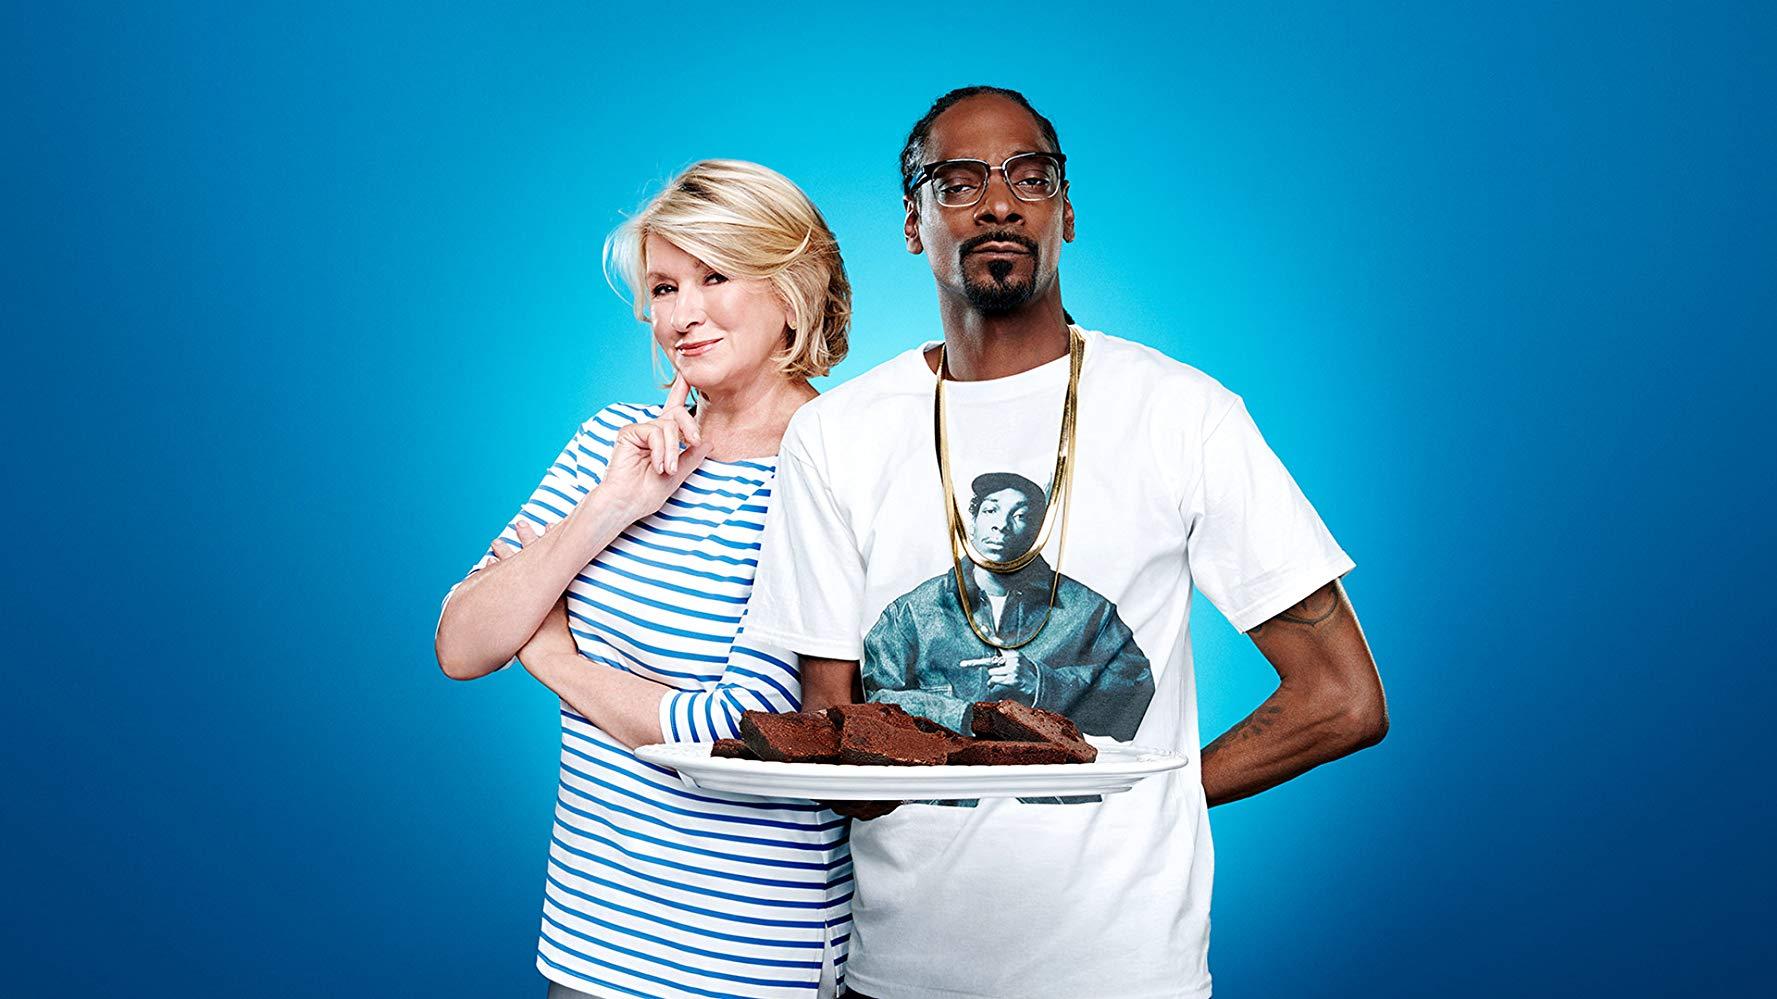 Martha and Snoops Potluck Dinner Party S02E16 WEB x264-TBS